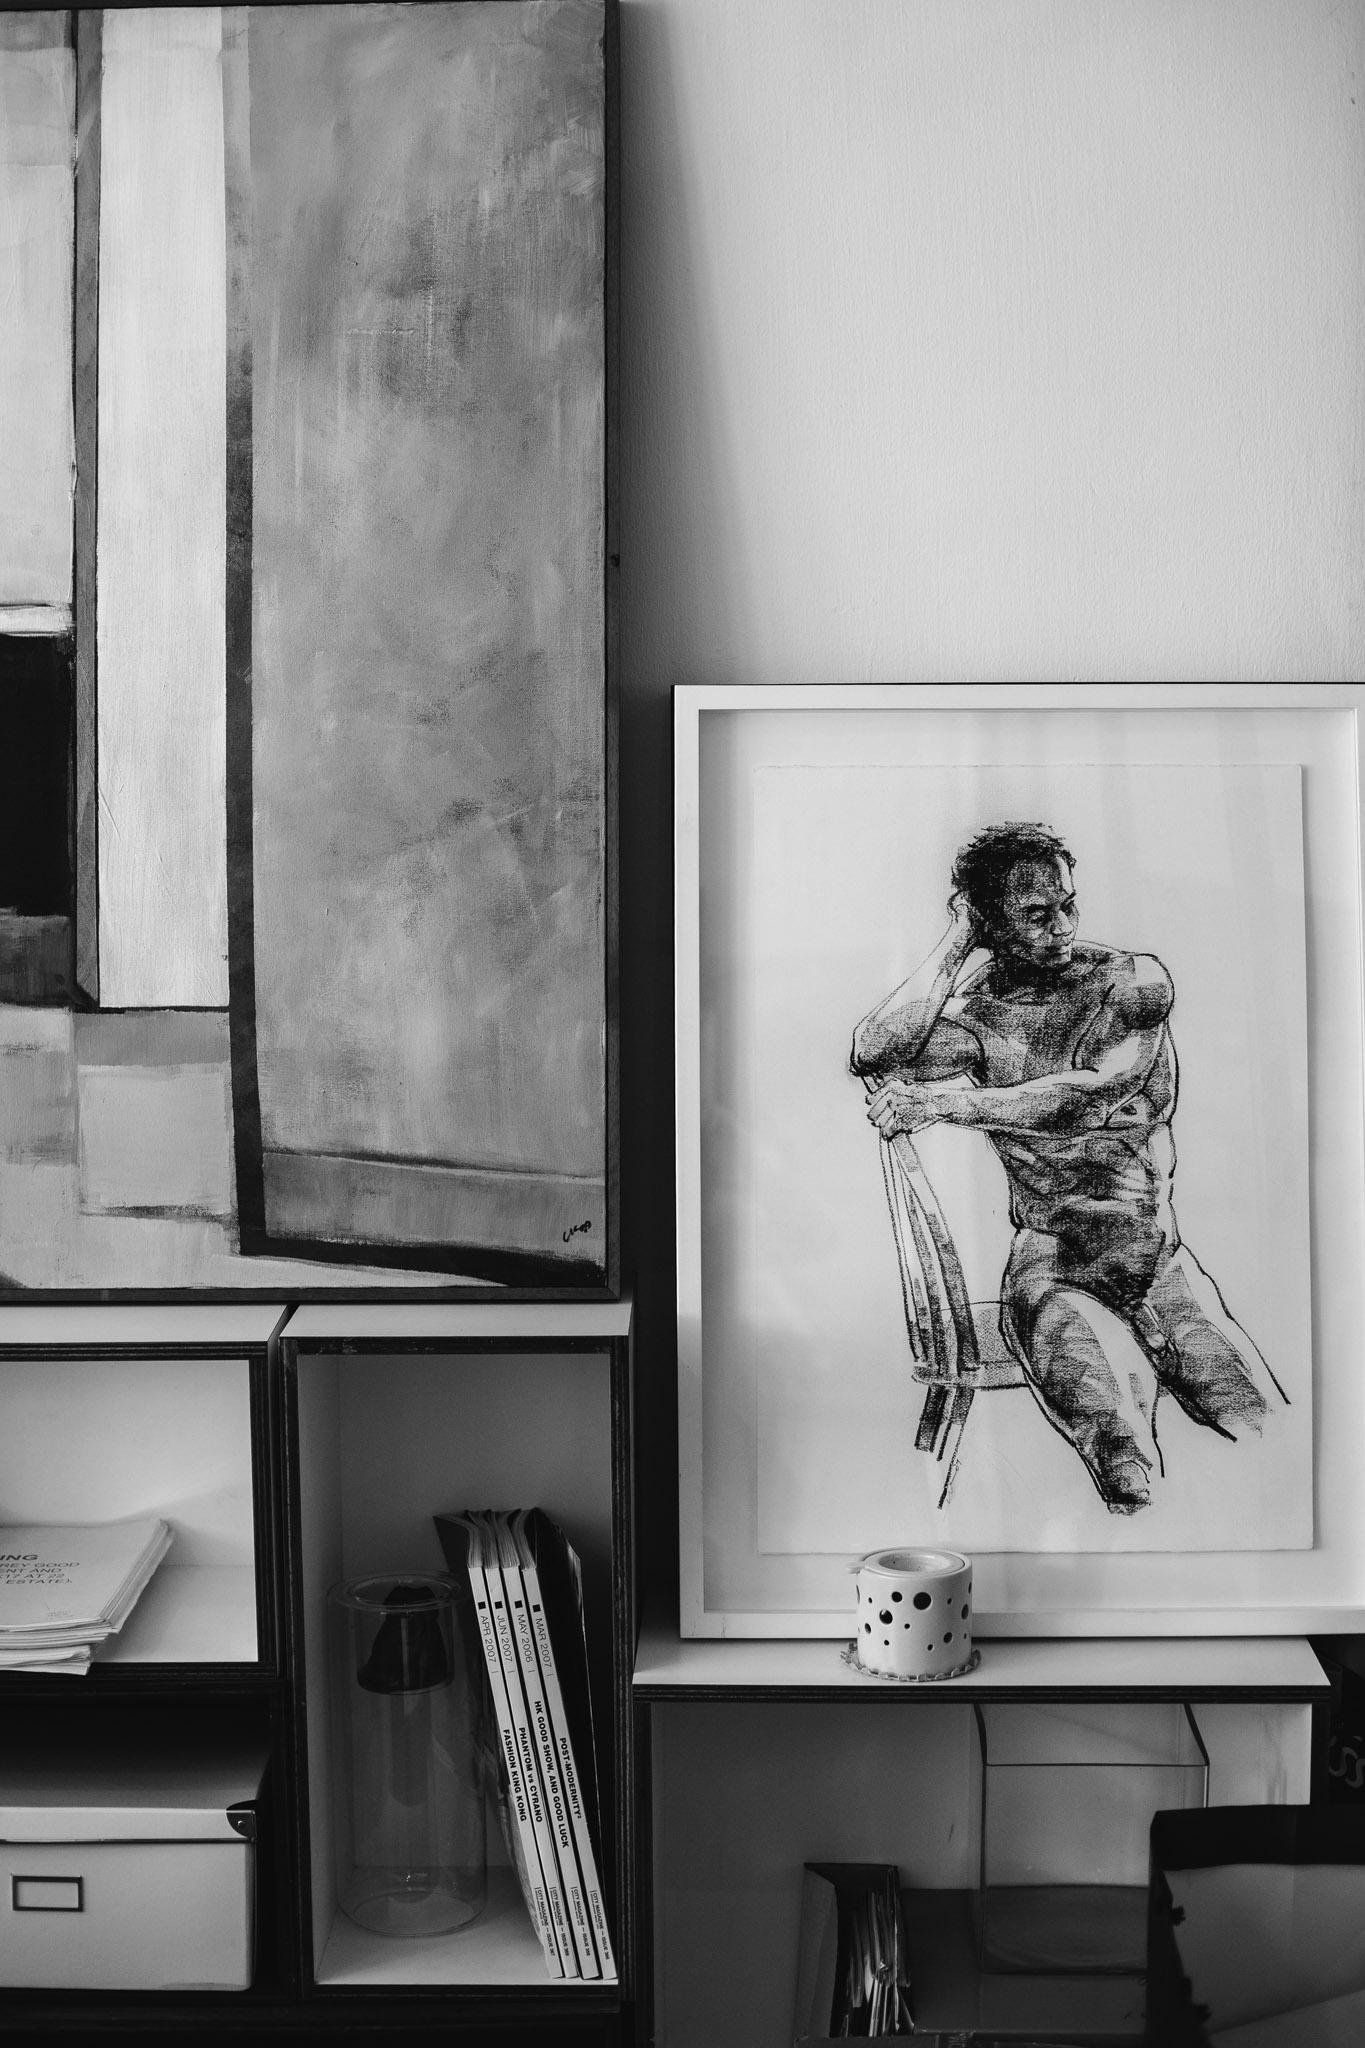 singapore-commercial-editorial-photographer-portraiture-architect-lim-cheng-kooi-AR43-zakaria-zainal-02.jpg